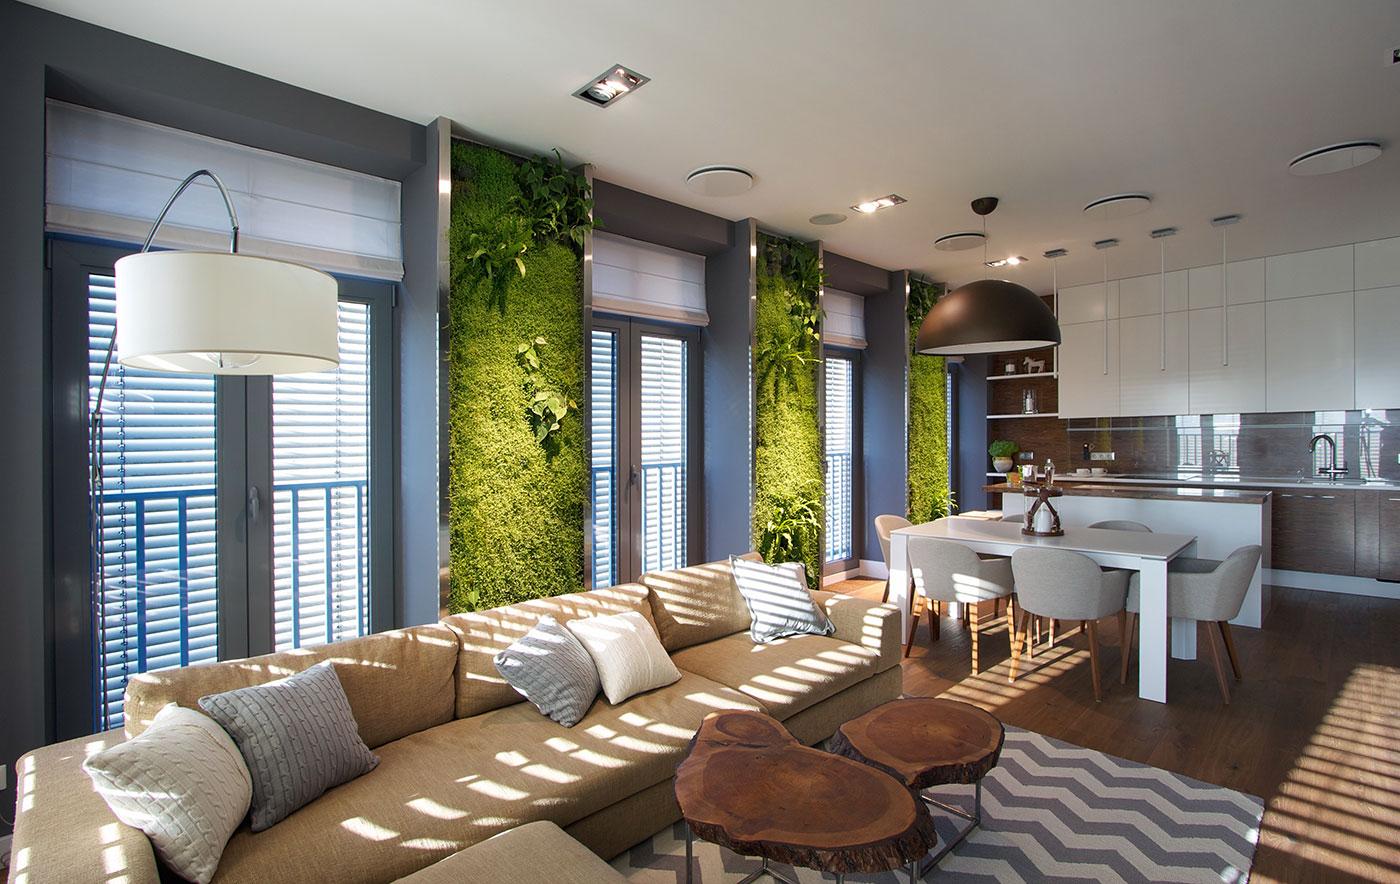 Modern Apartment Design: Green Walls by SVOYA - Architecture Beast